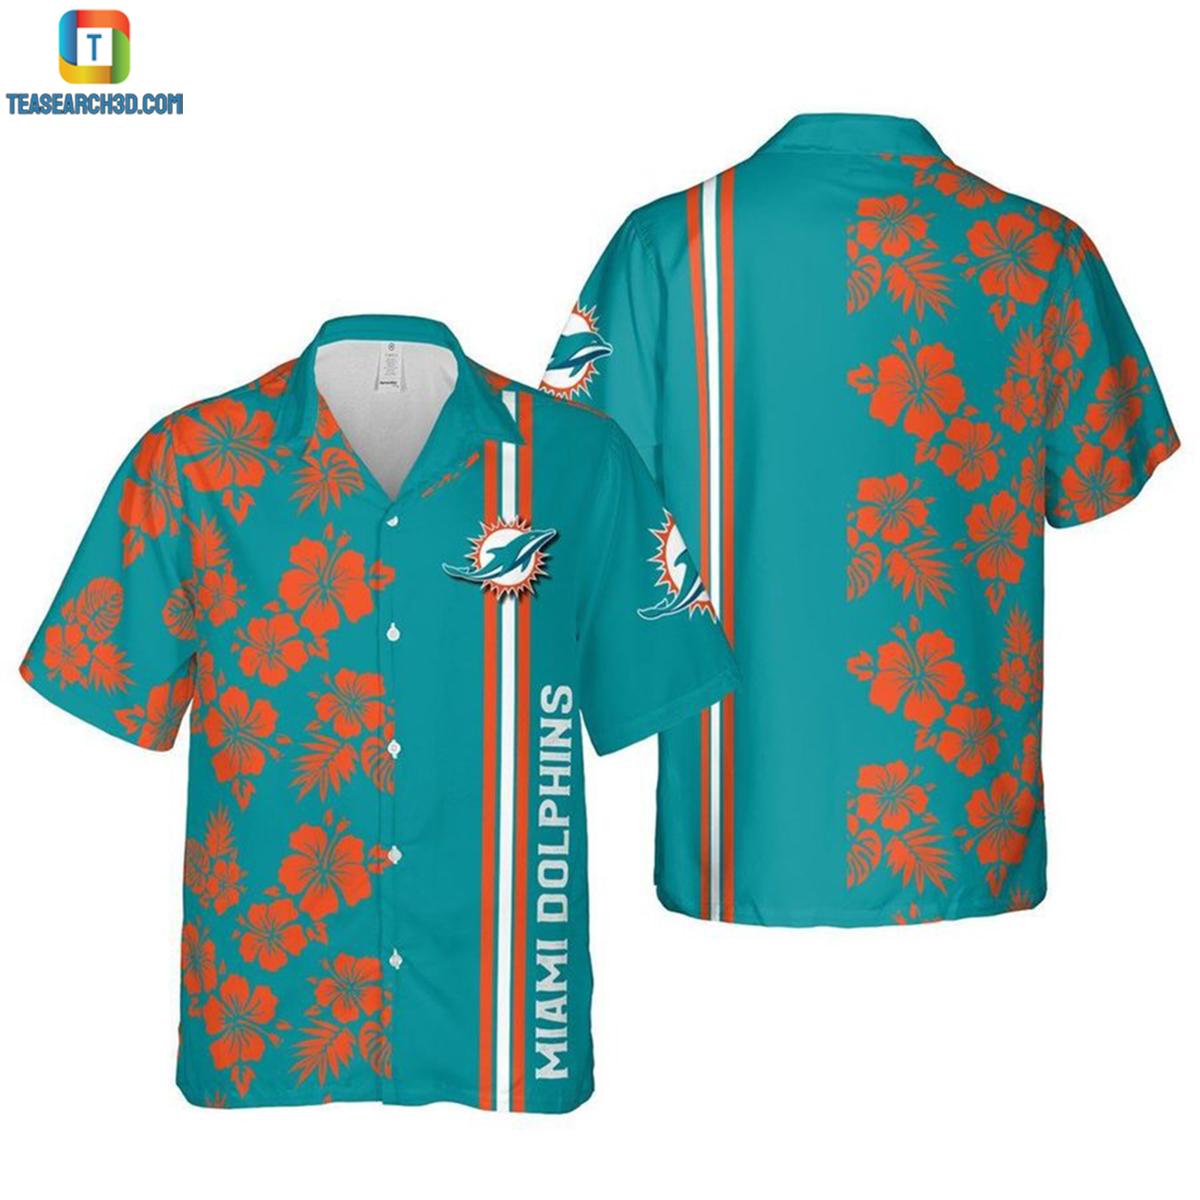 Miami dolphins floral nfl football hawaiian shirt 2